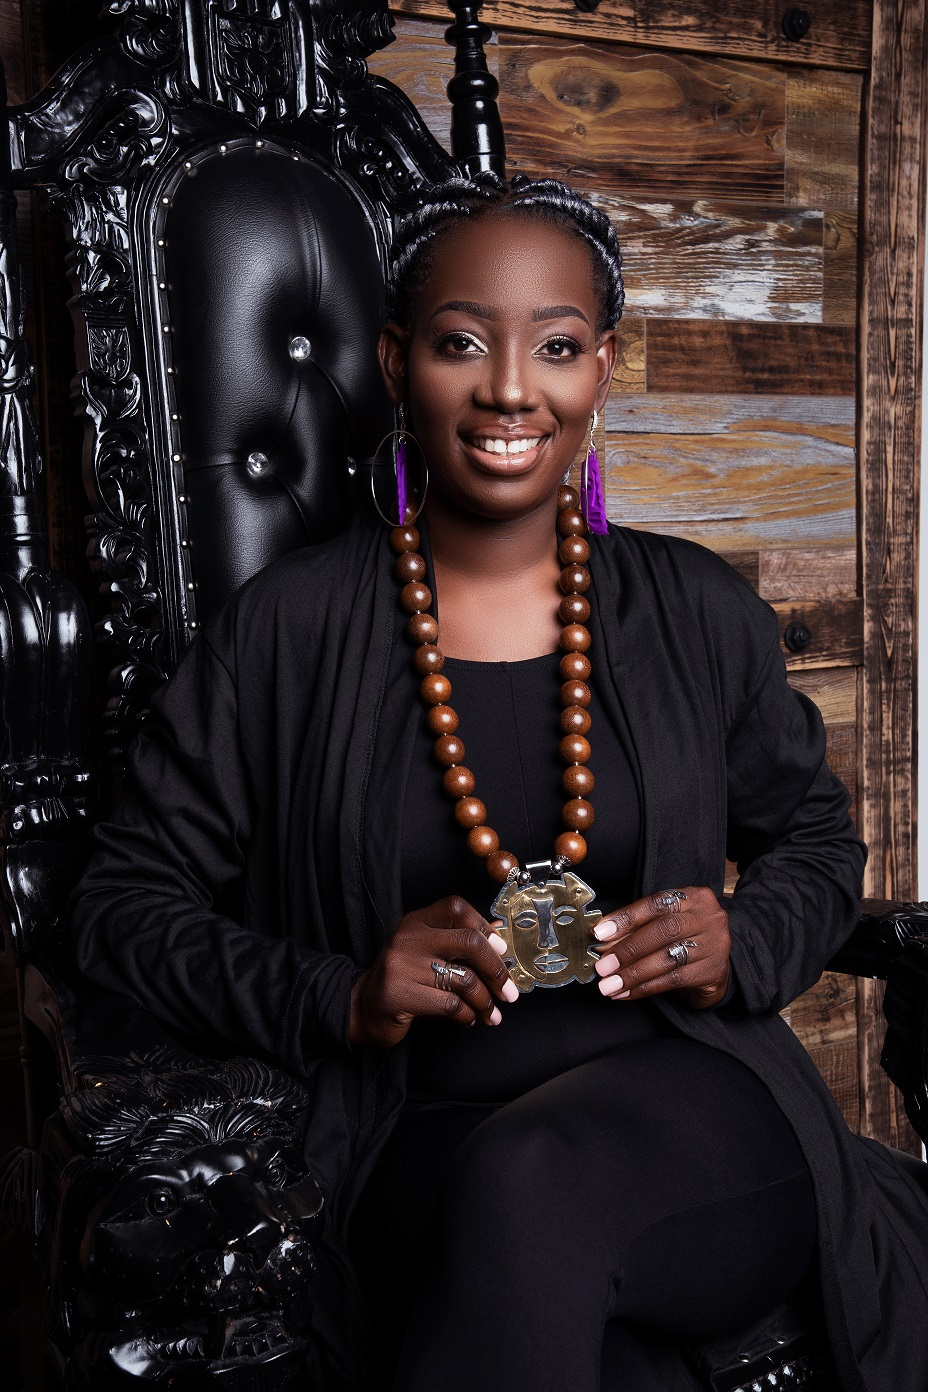 zuri-perle-african-inspired-accessories-brand-lead-designer-and-owner-atinuke-osibogun-adeleke.jpg